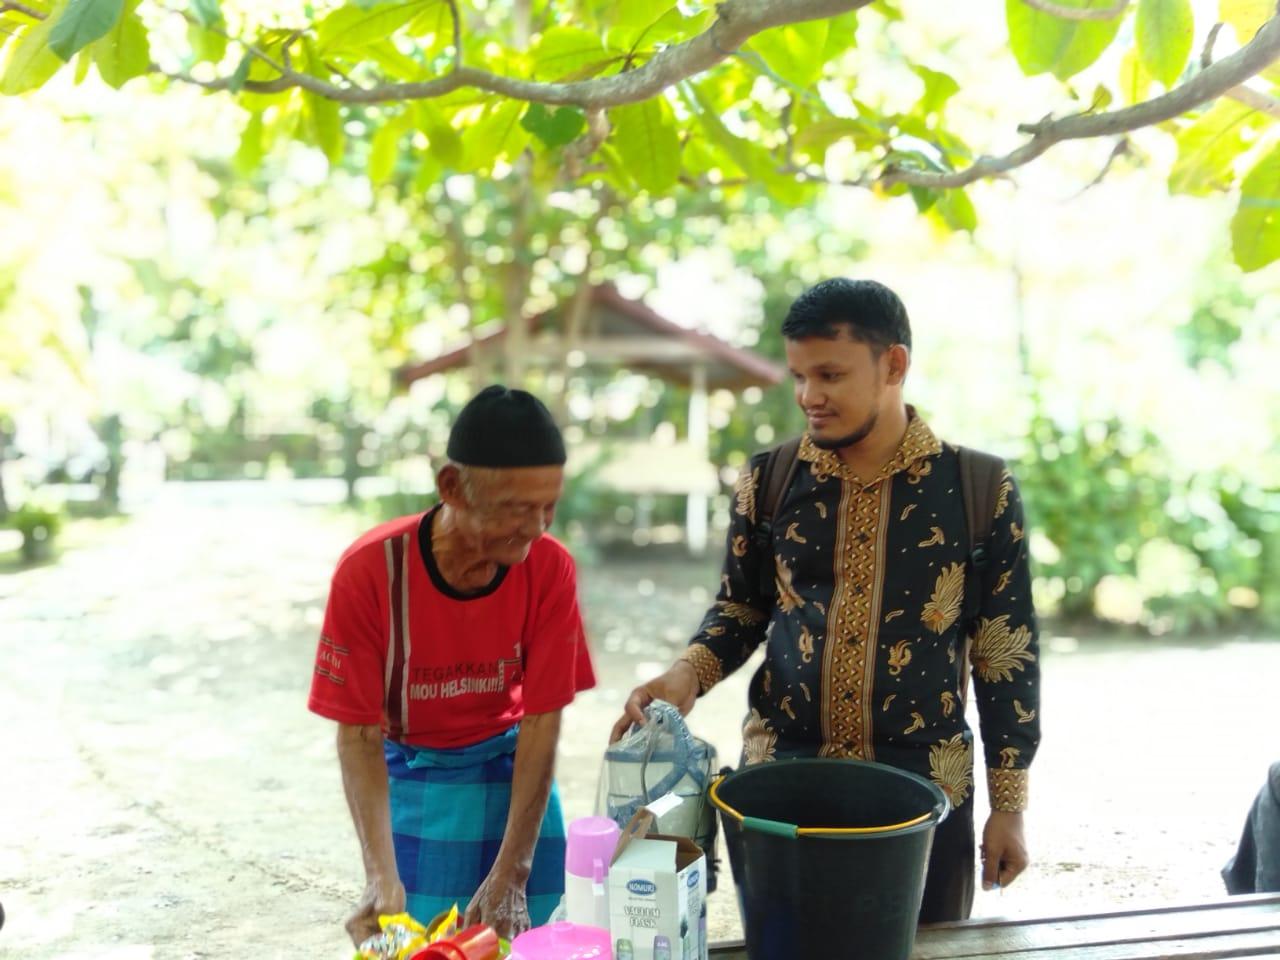 Lembaga Peduli Dhuafa Kembali membuat Tgk. Andip Tersenyum, sambil mengucapkan terimakasih kepada Dermawan yang telah membantunya